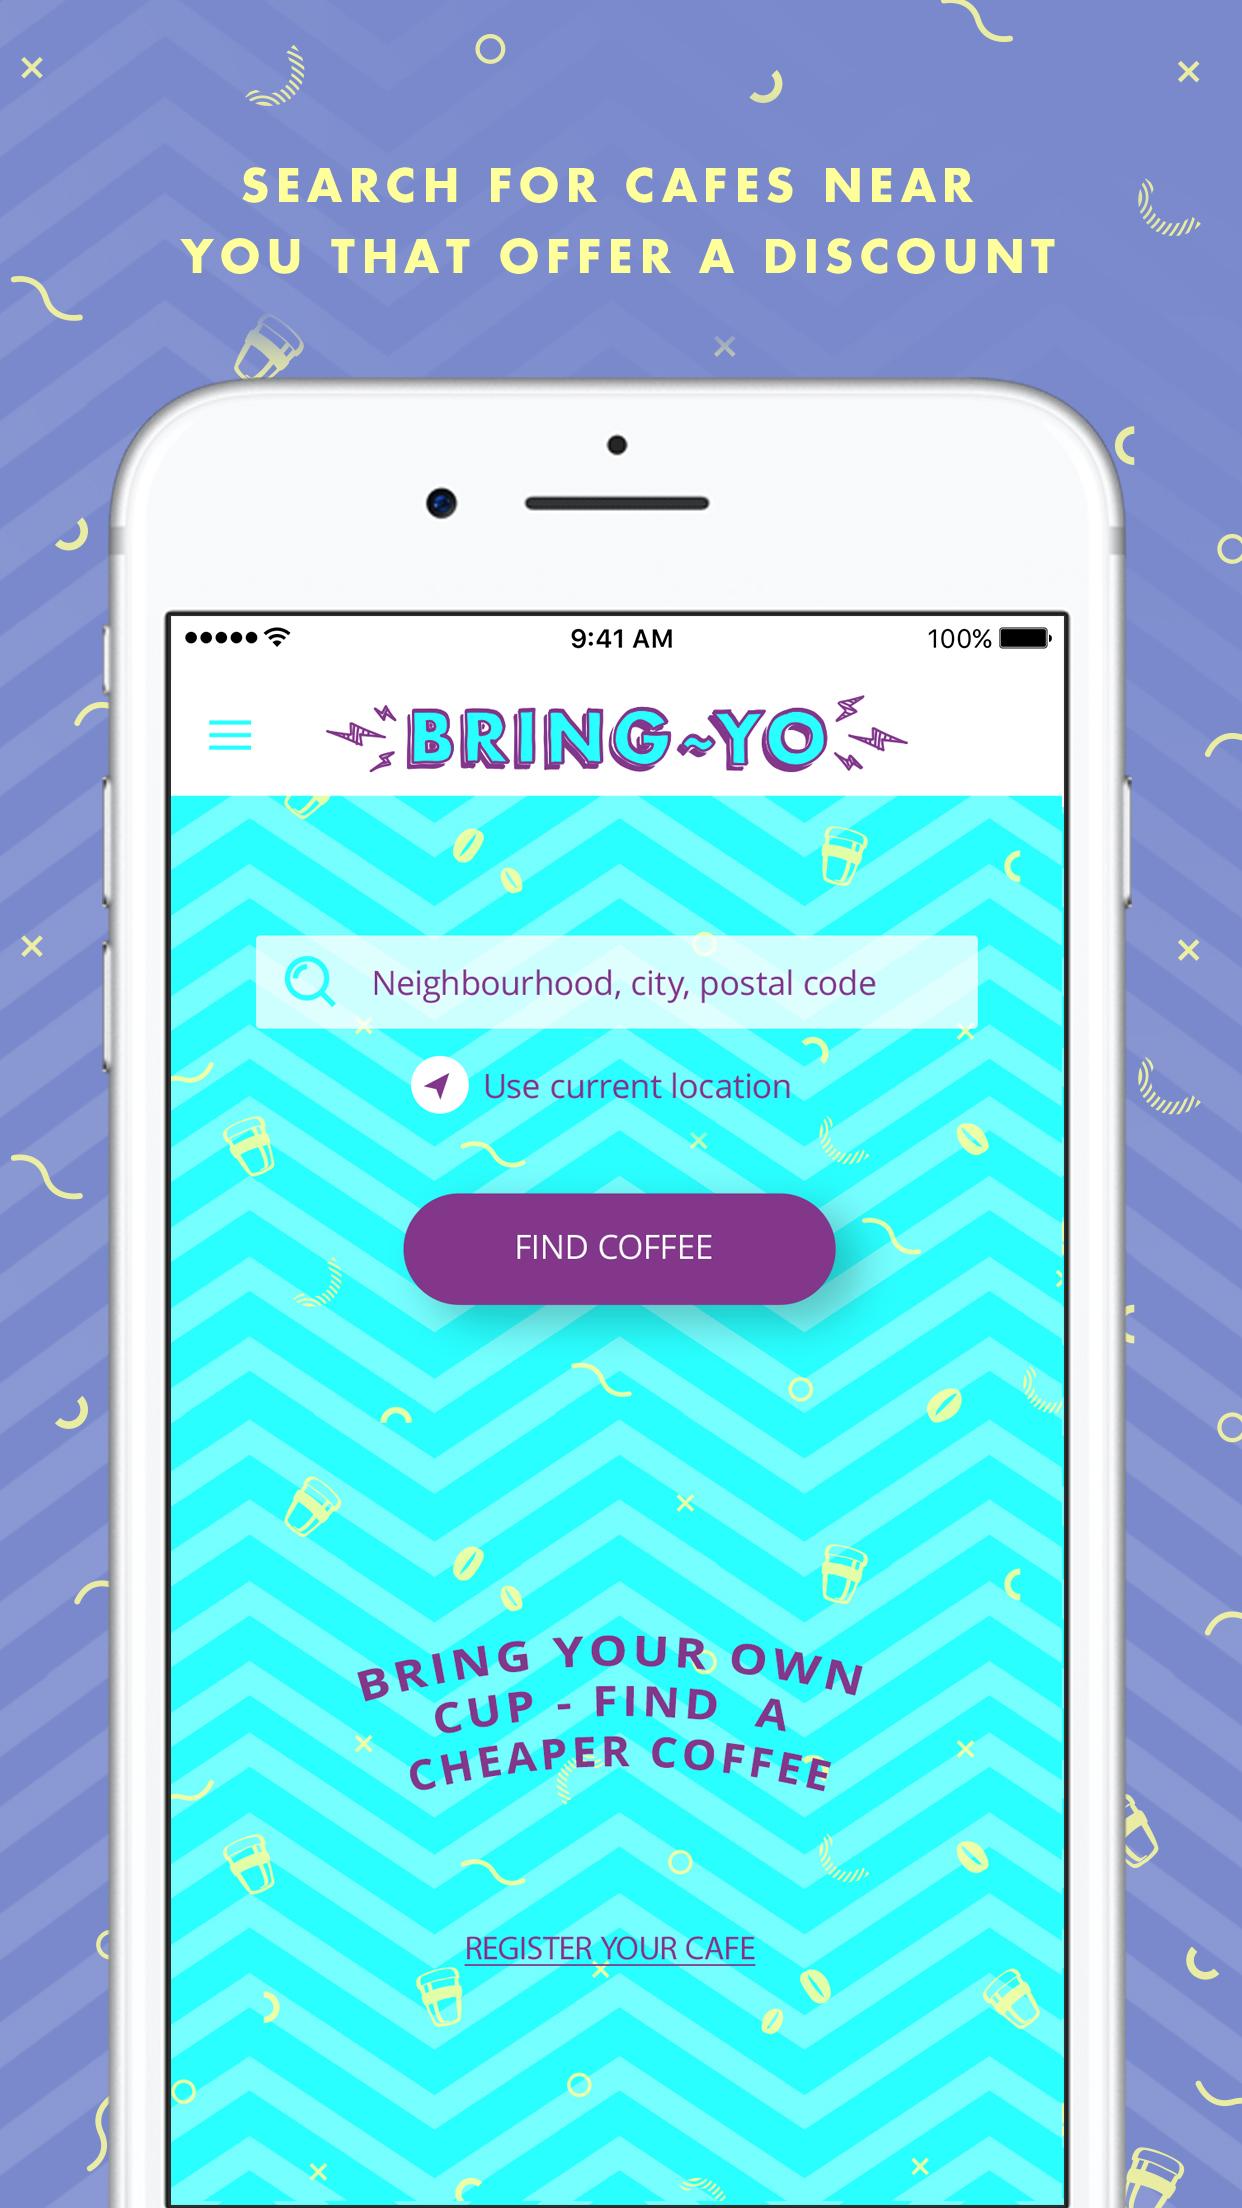 Bringyo screenshot 1.jpg